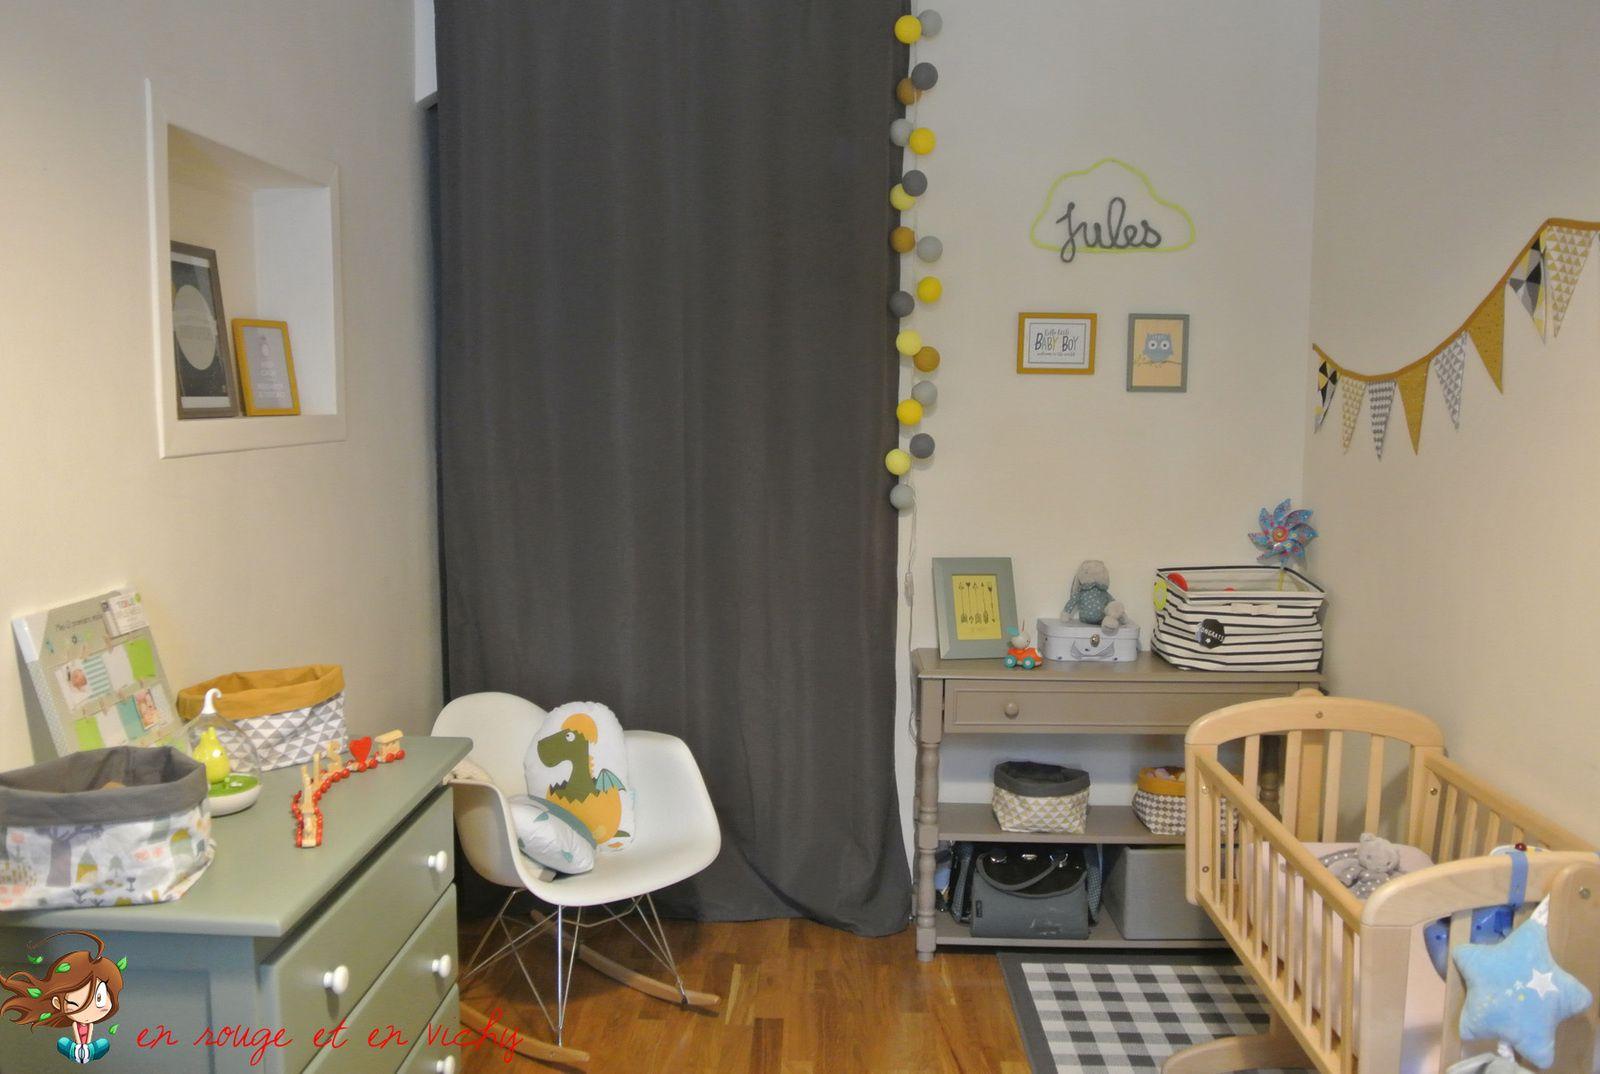 La chambre de babyboy